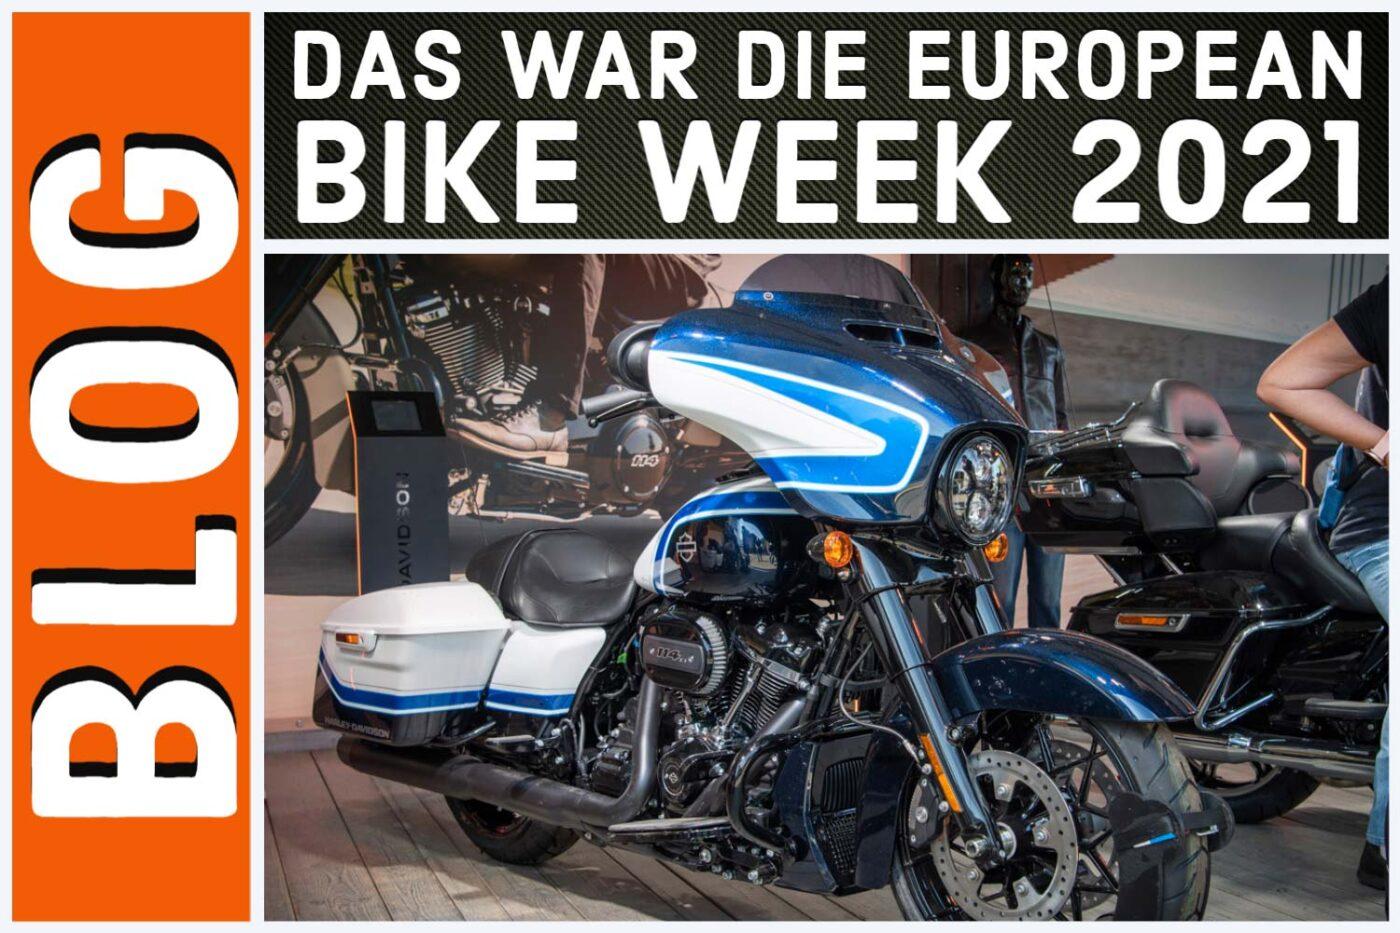 Harleysite Blog - European Bike Week 2021